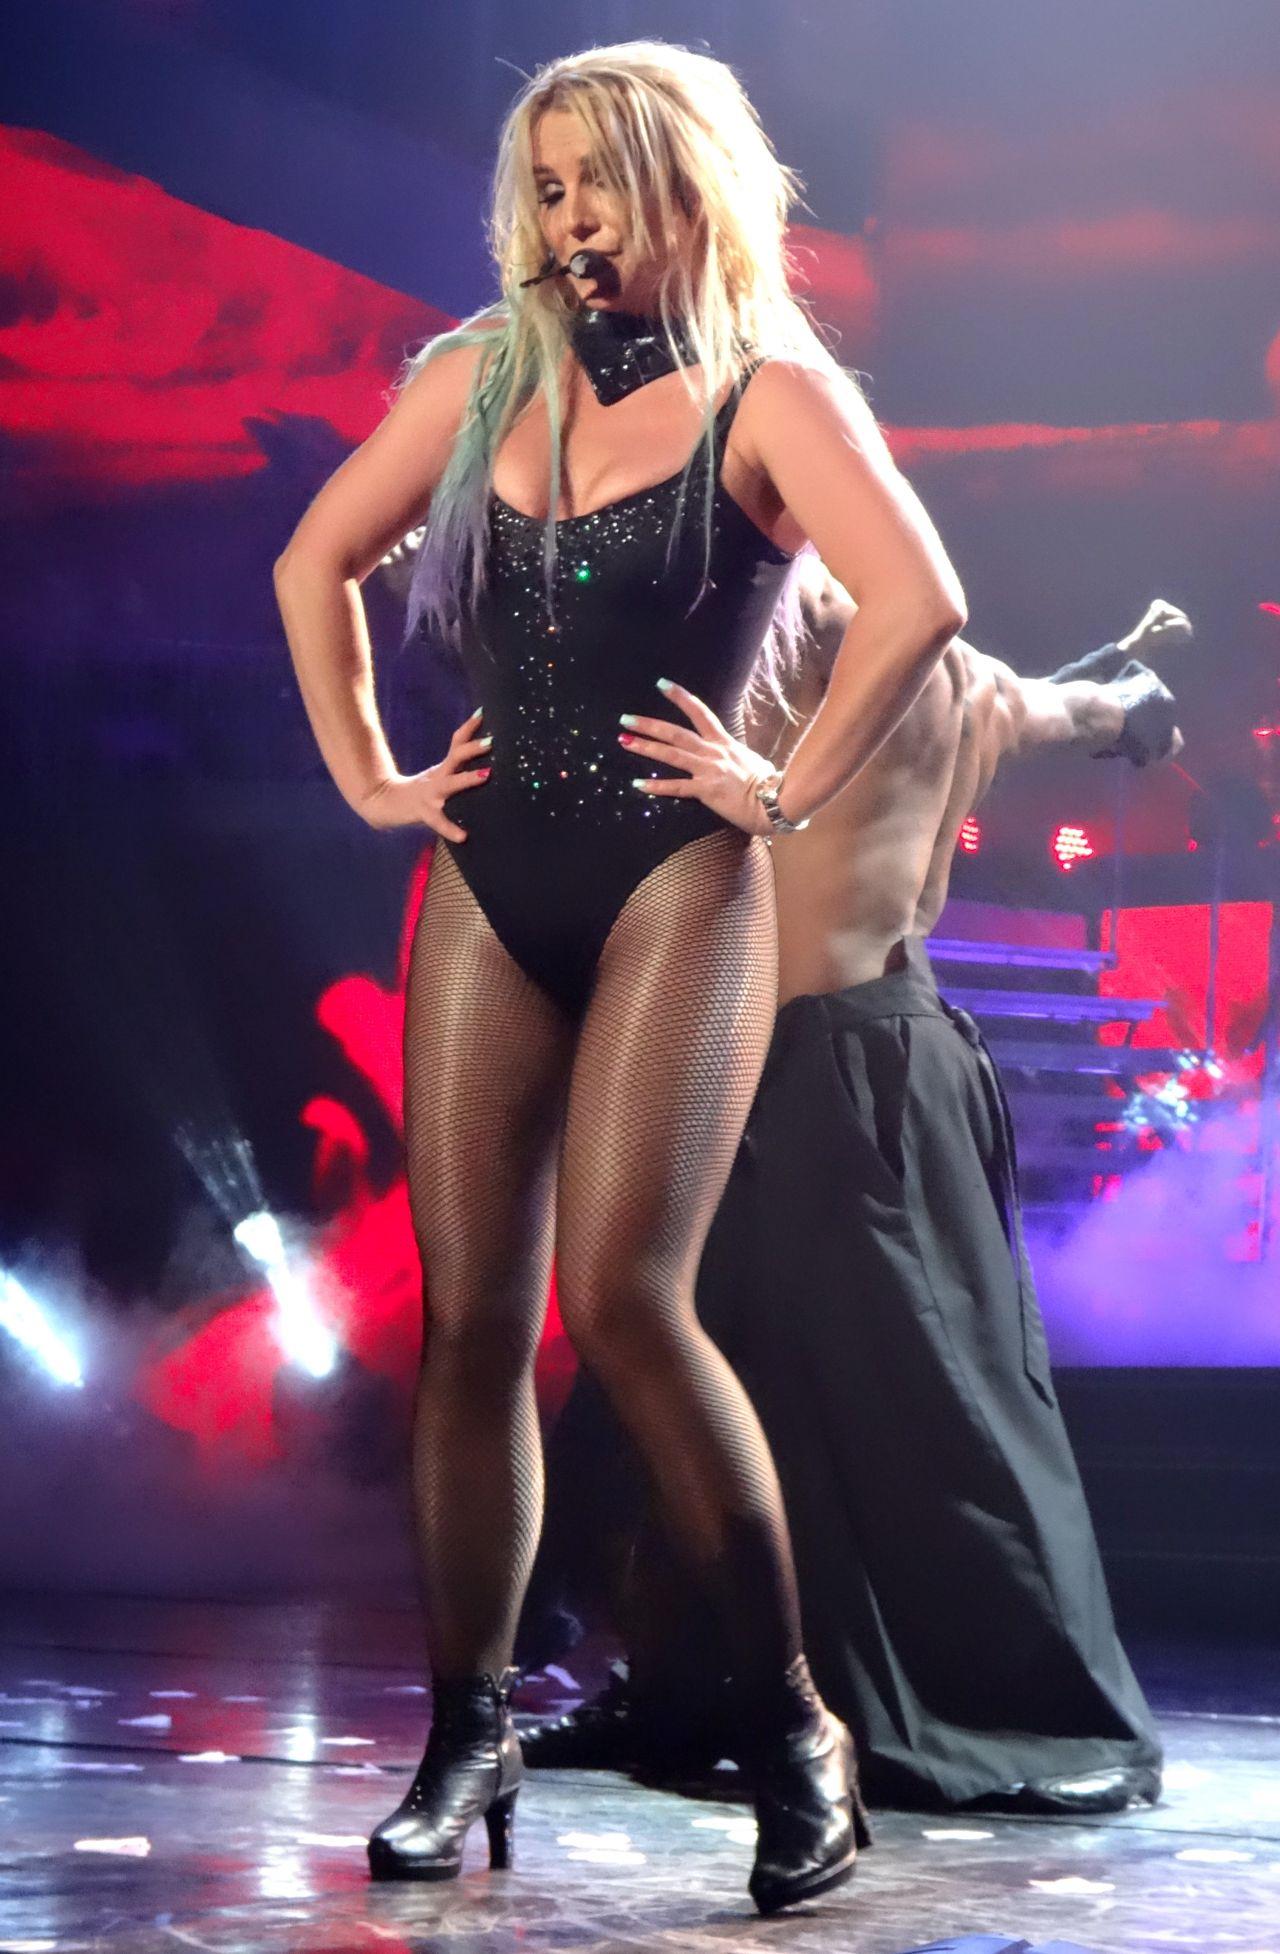 Britney spears 2016 billboard music awards performance - 2 part 10